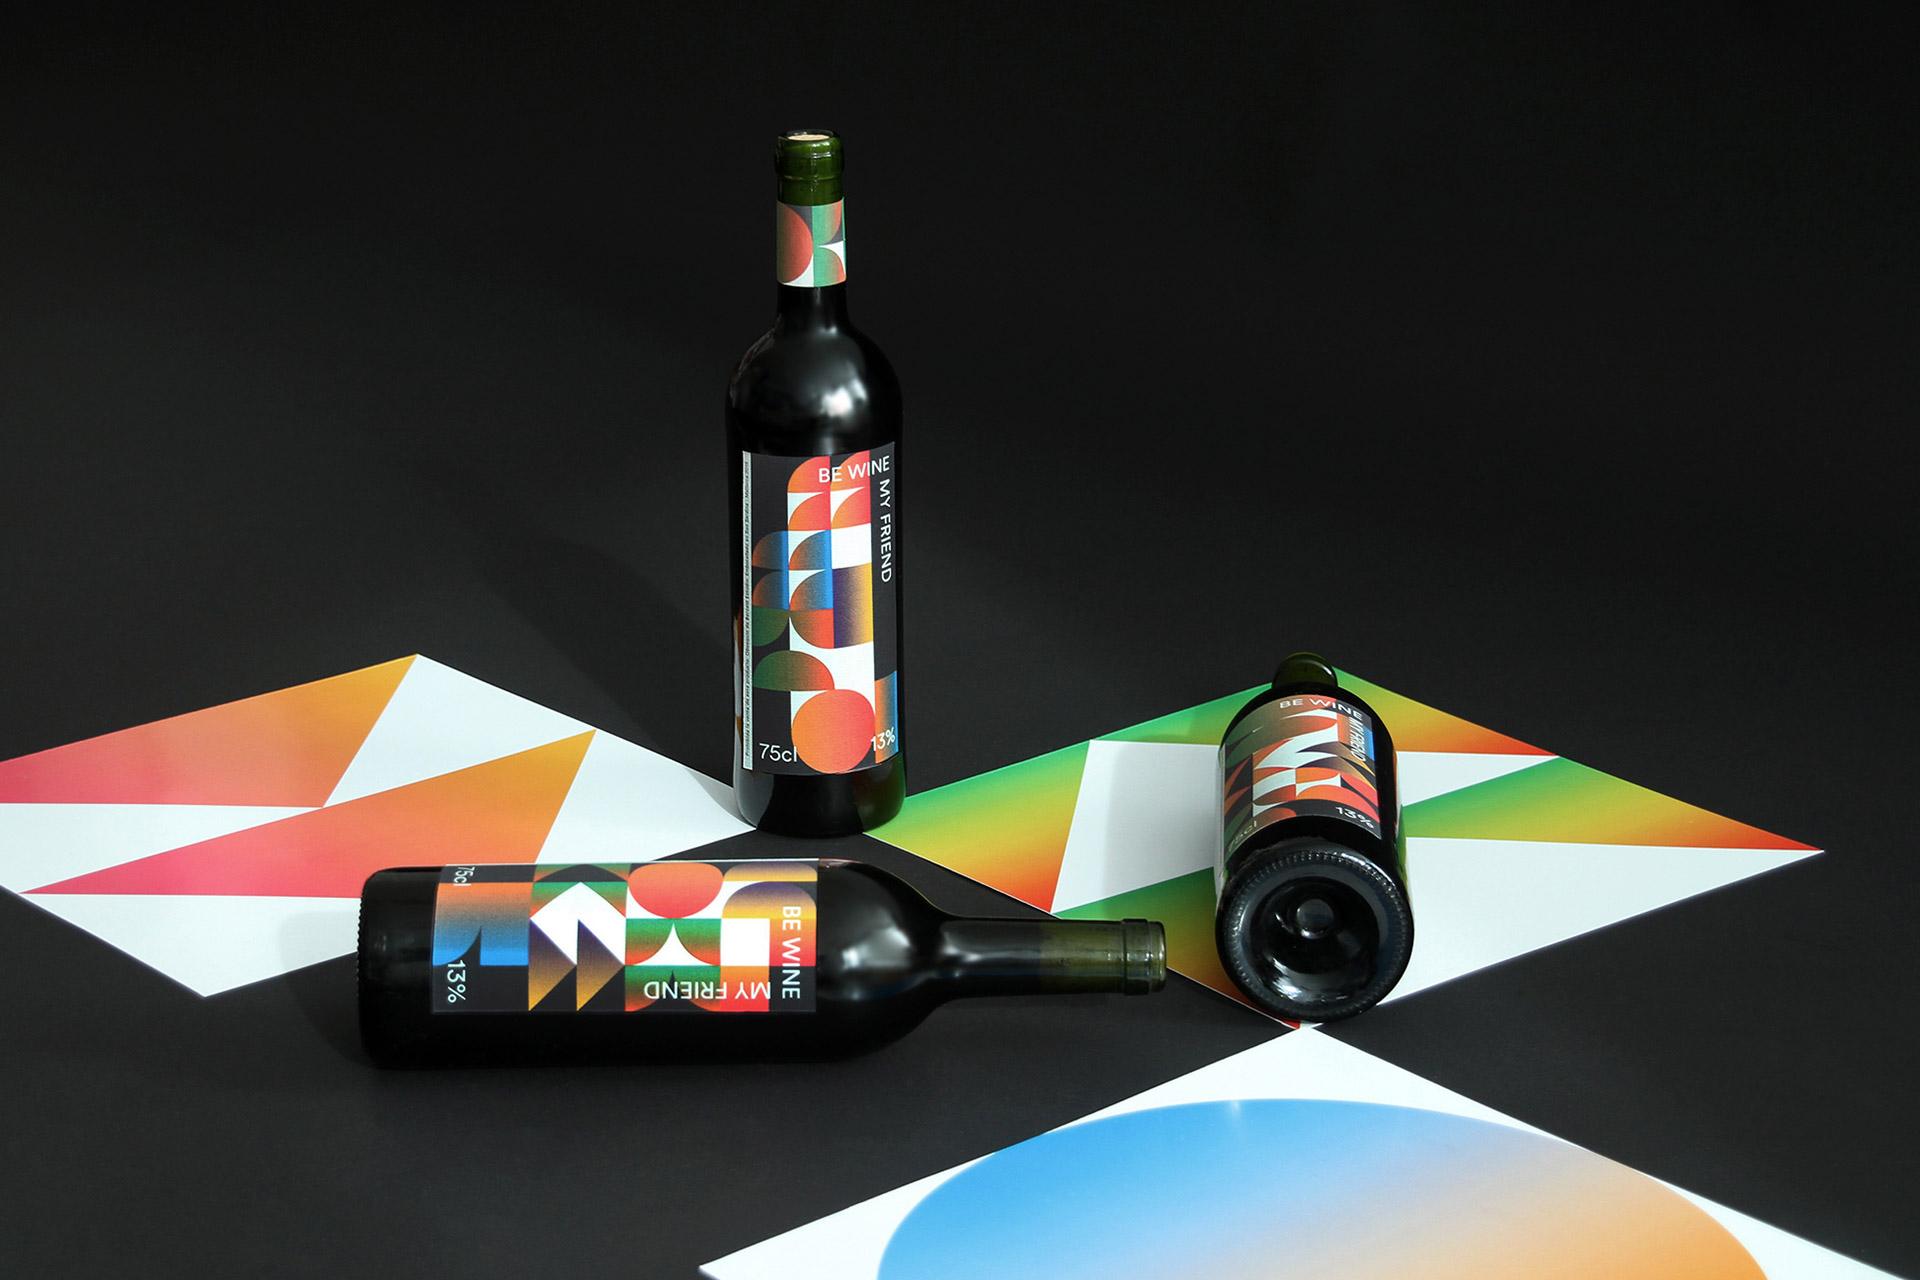 Be winBe Wine My Friend  by Barceló estudio - Creative Work